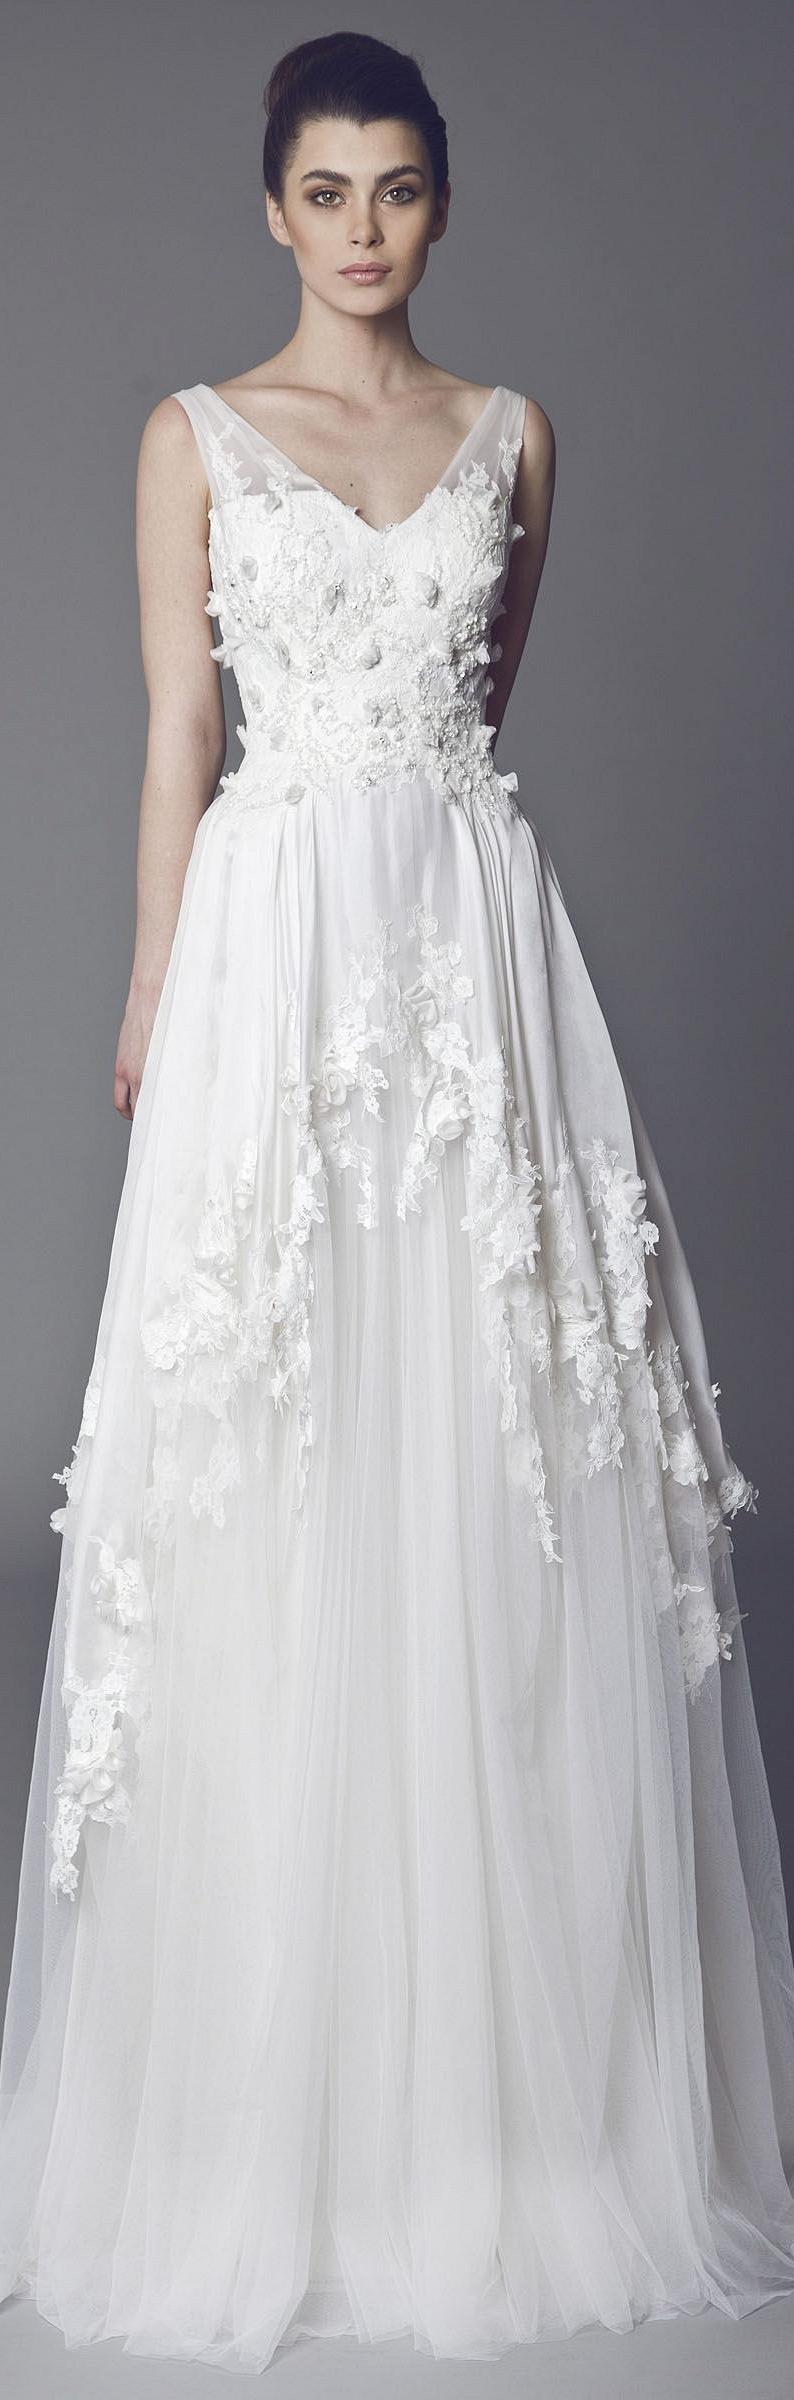 Wedding dresses, plus size, bridal underwear, shoes, veils, tights ...